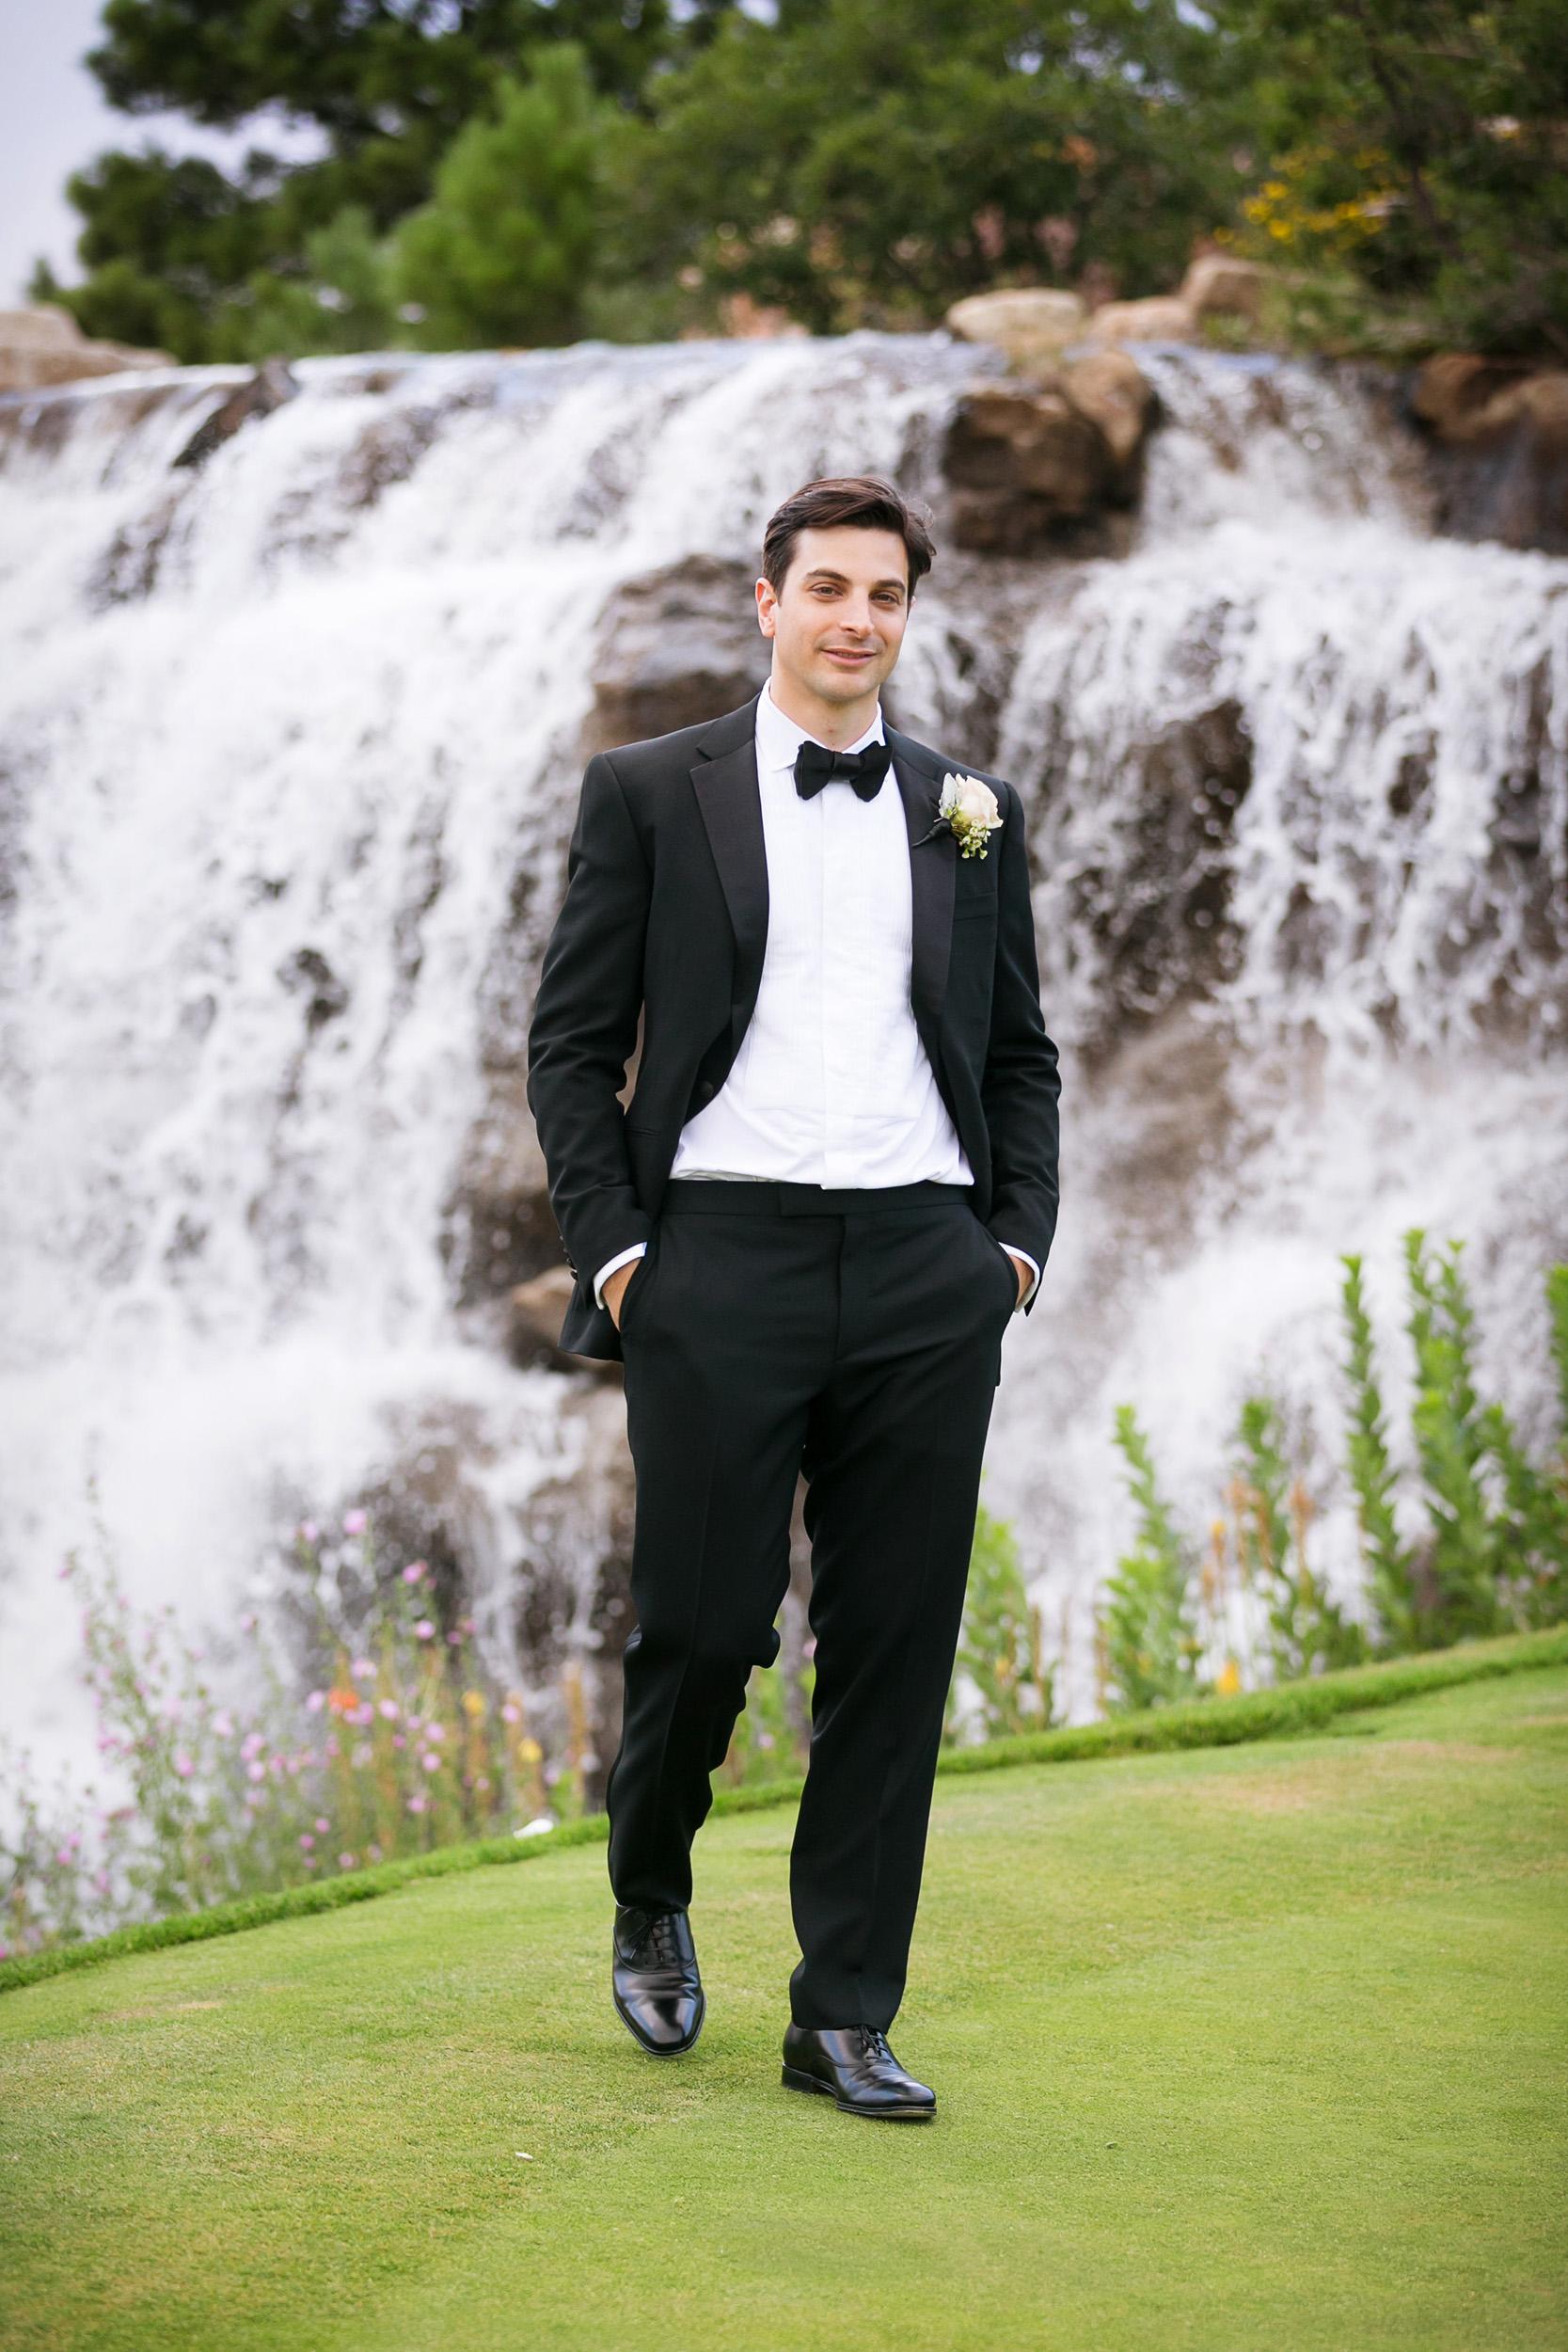 Wedding-at-Sanctuary-Golf-005.jpg